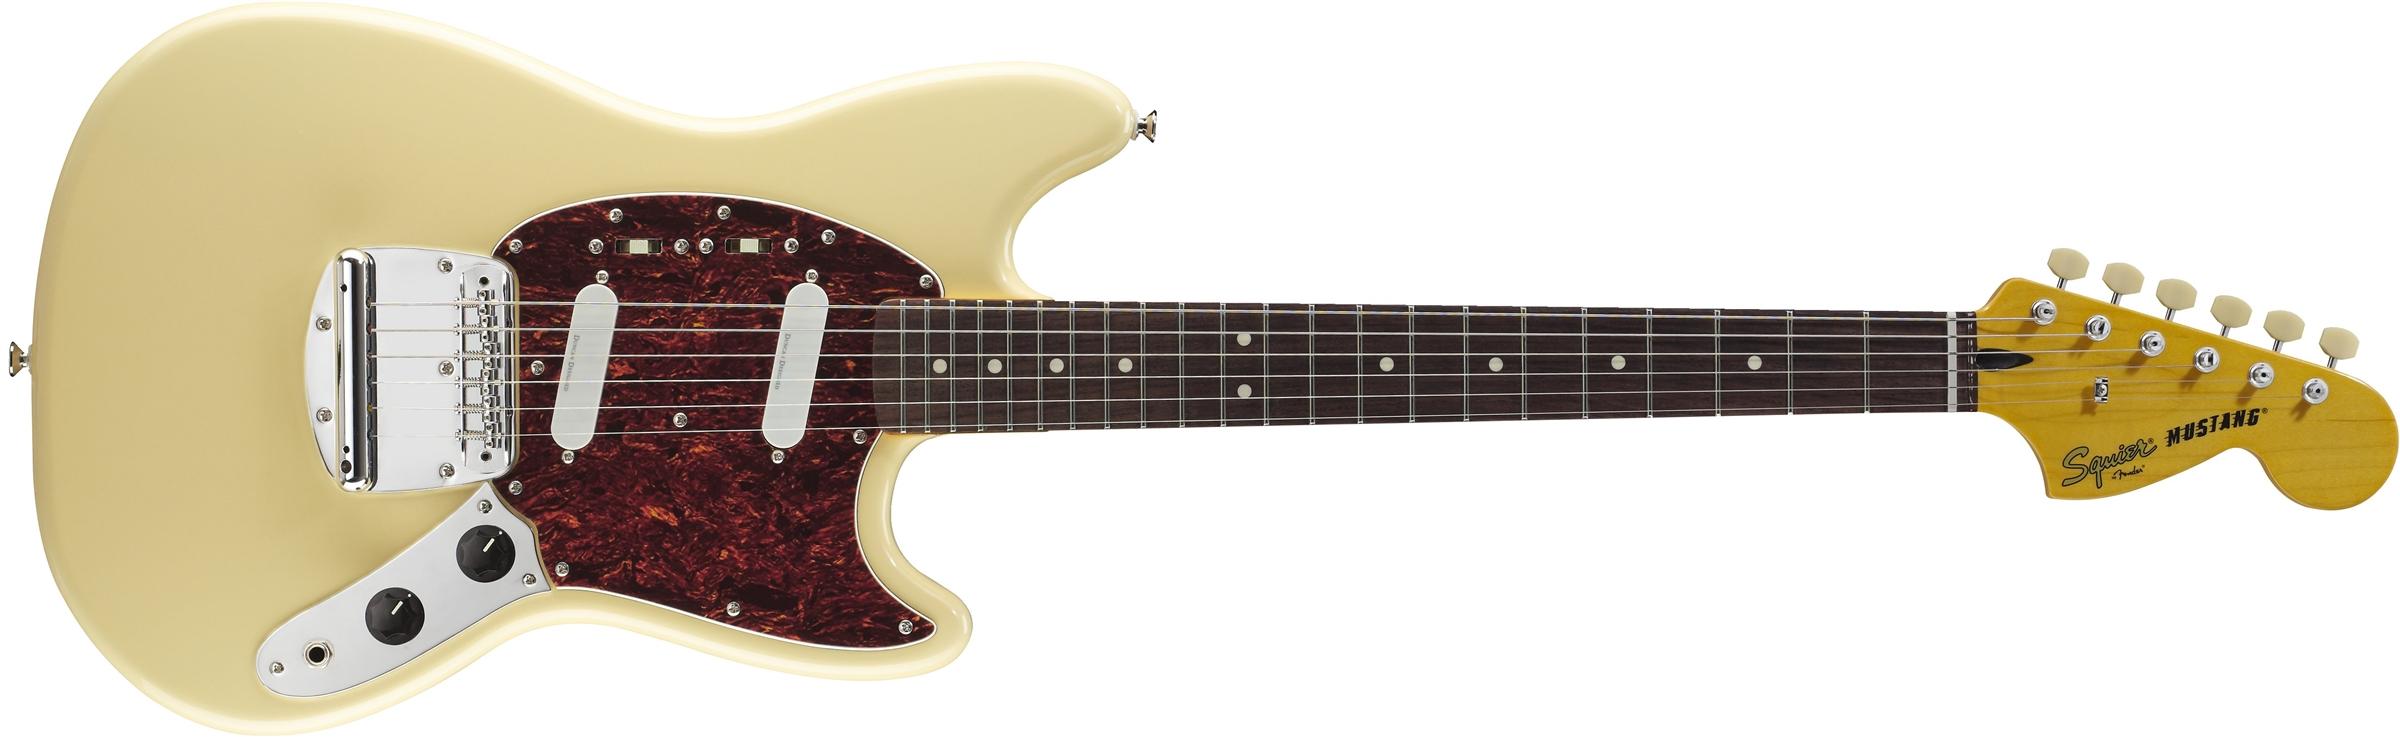 vintage modified mustang squier electric guitars. Black Bedroom Furniture Sets. Home Design Ideas